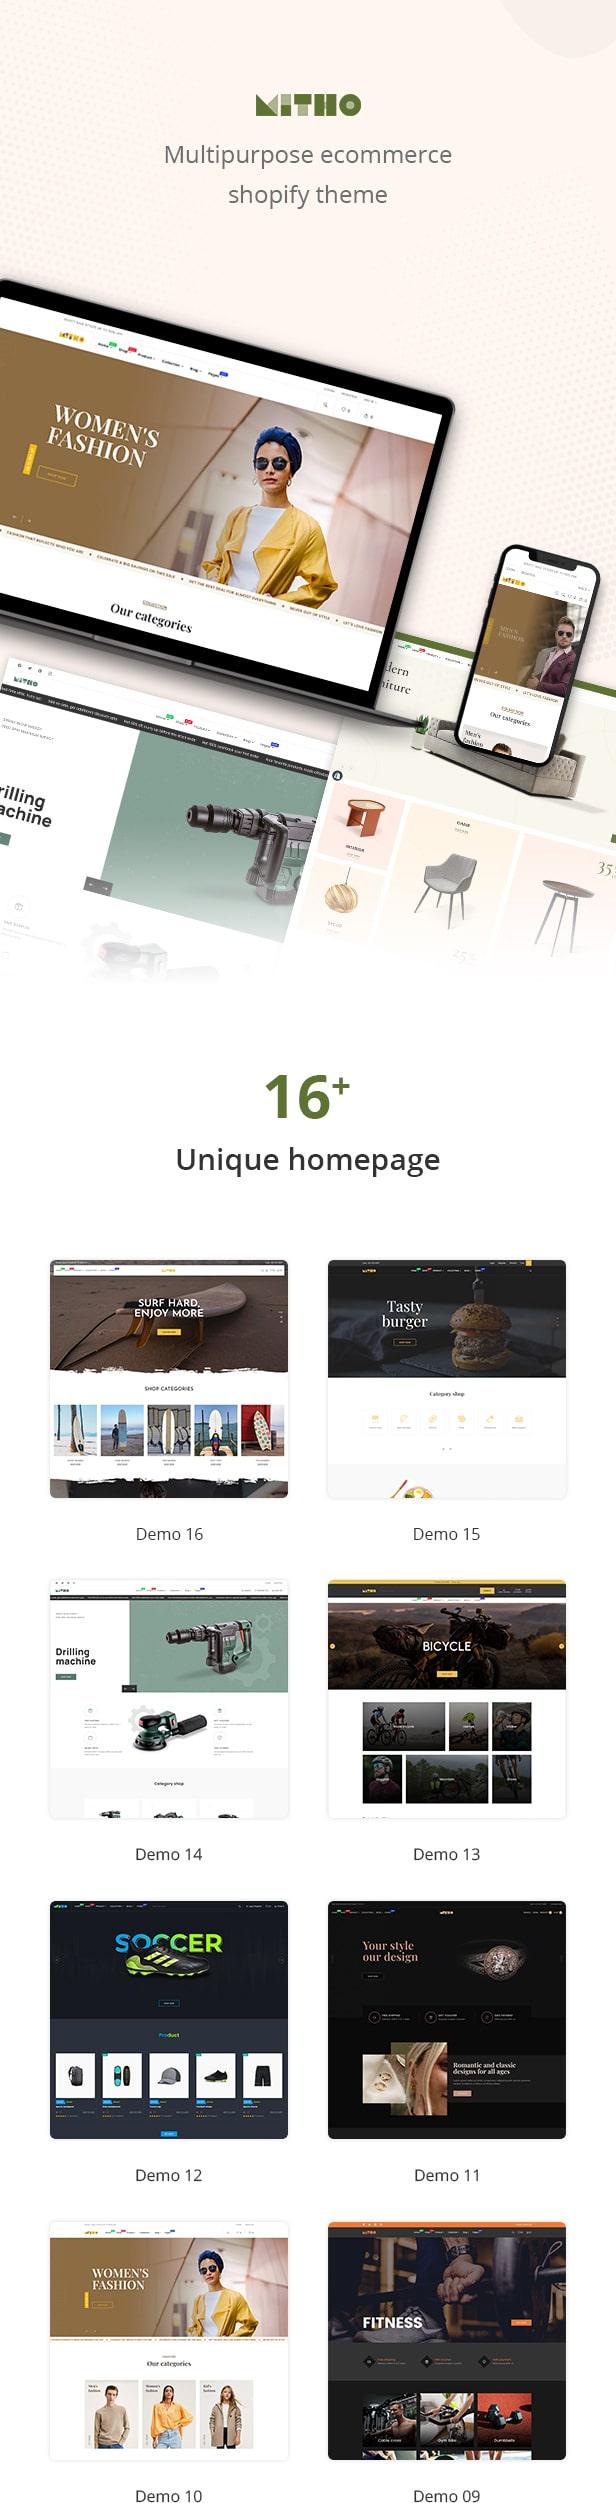 Mitho - Multipurpose beauty, medical, foods shopify theme - 2